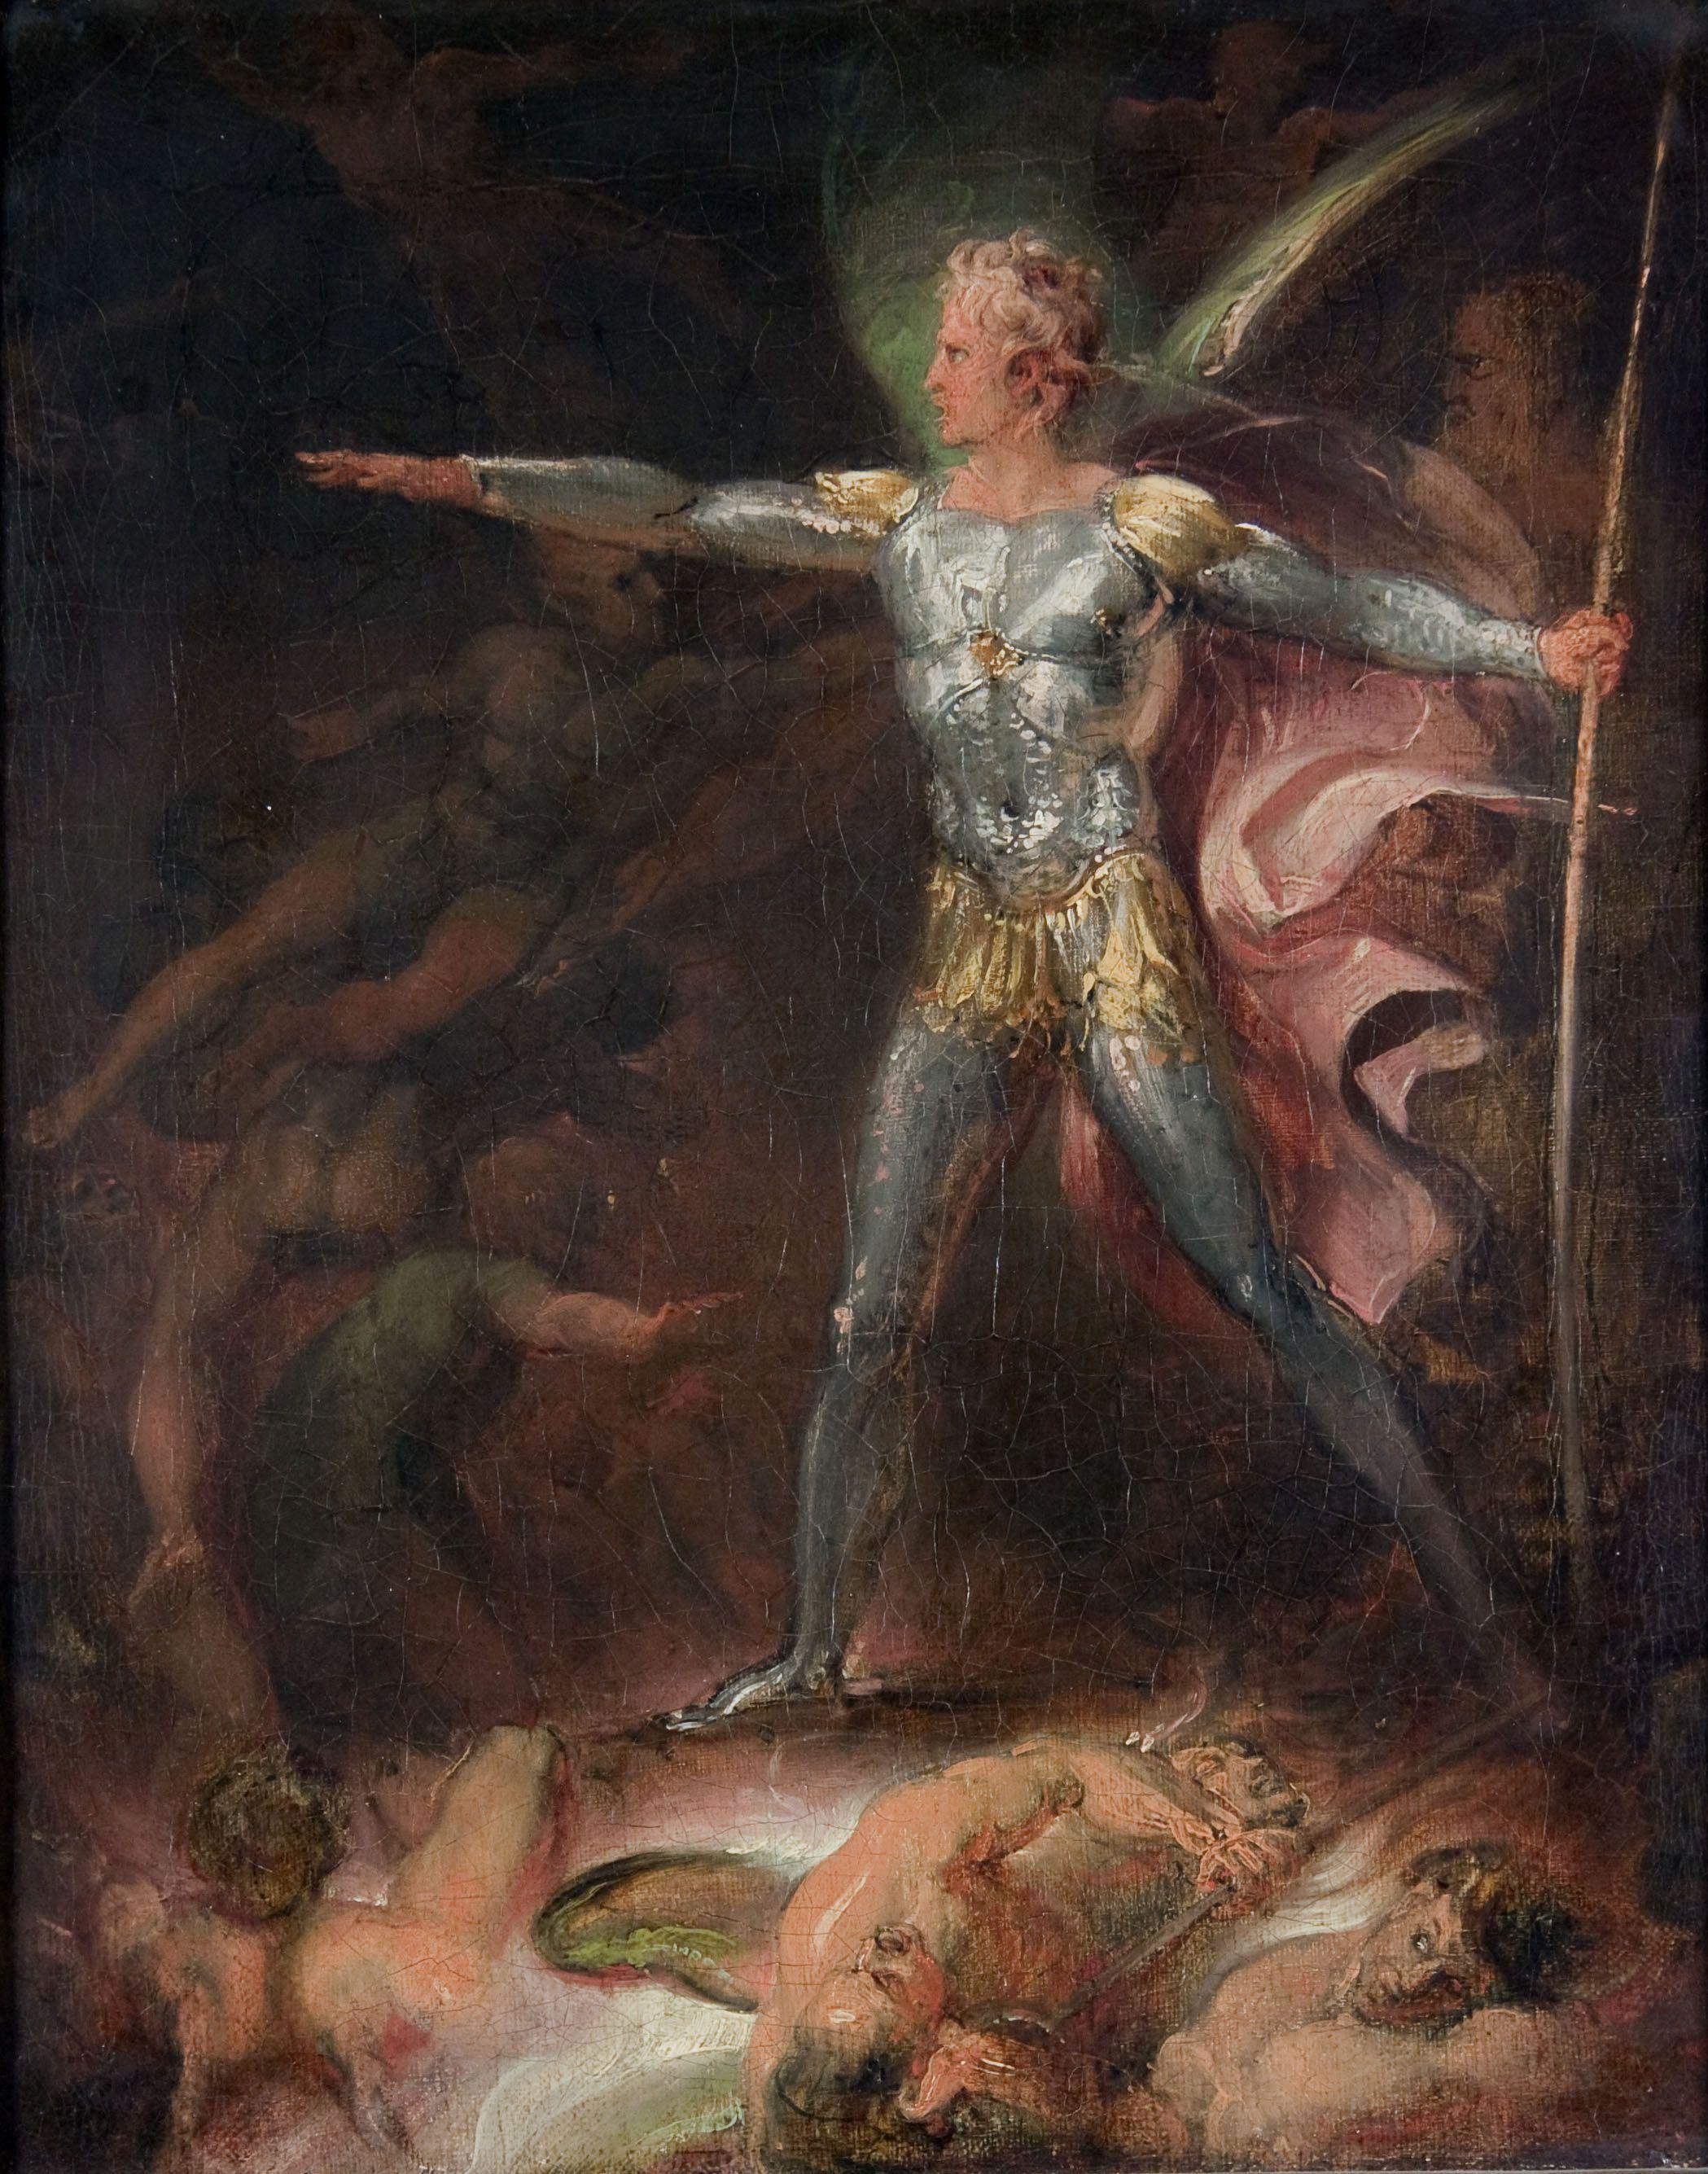 Satan Summoning His Legions by Stothard